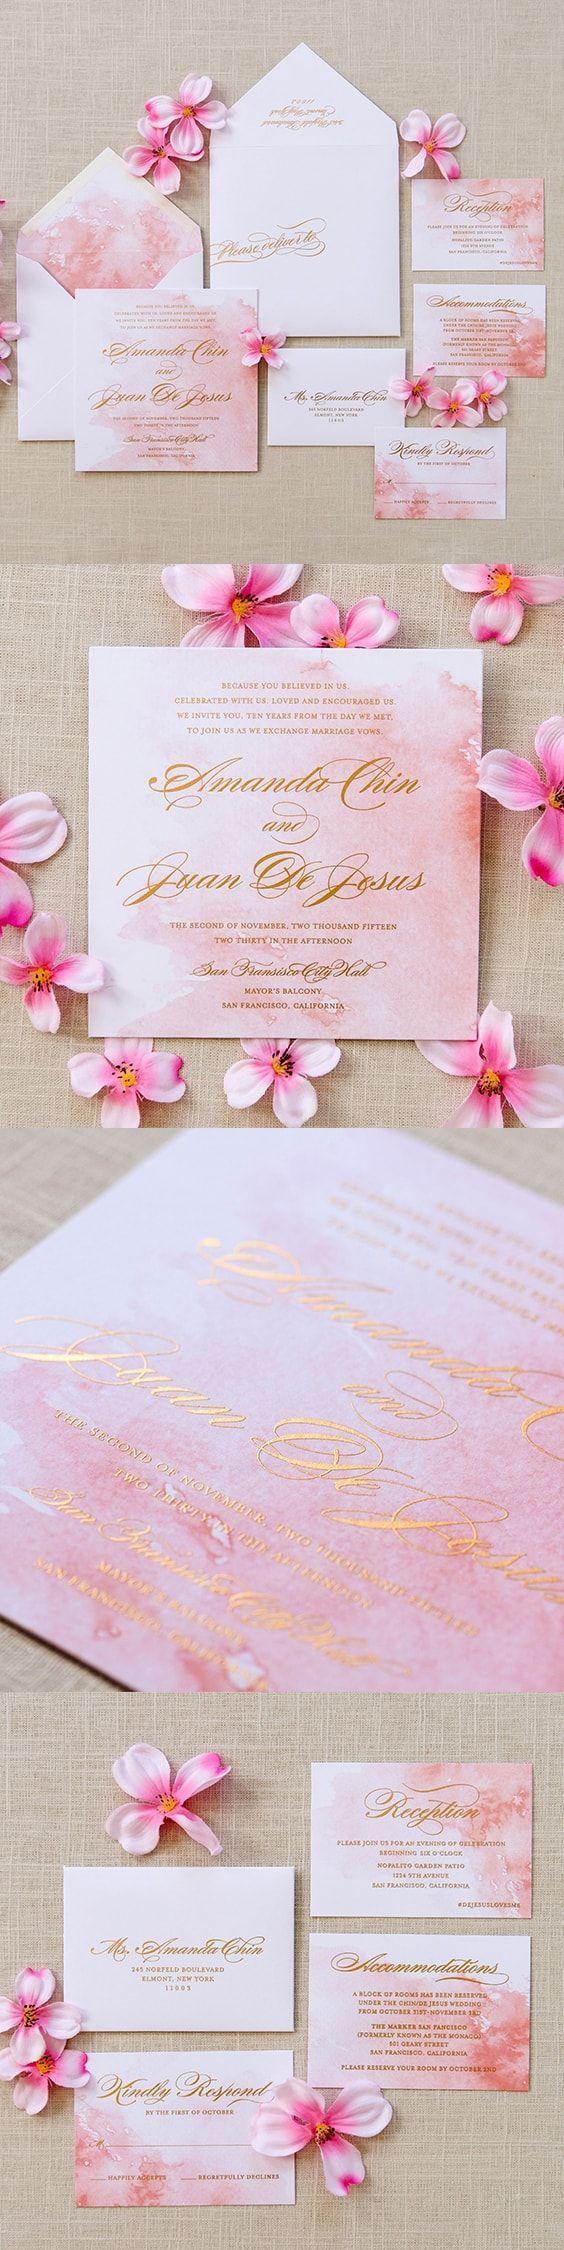 wedding invitations for less than dollar%0A Watercolor Wedding Invitation  Amanda Wedding Invitation